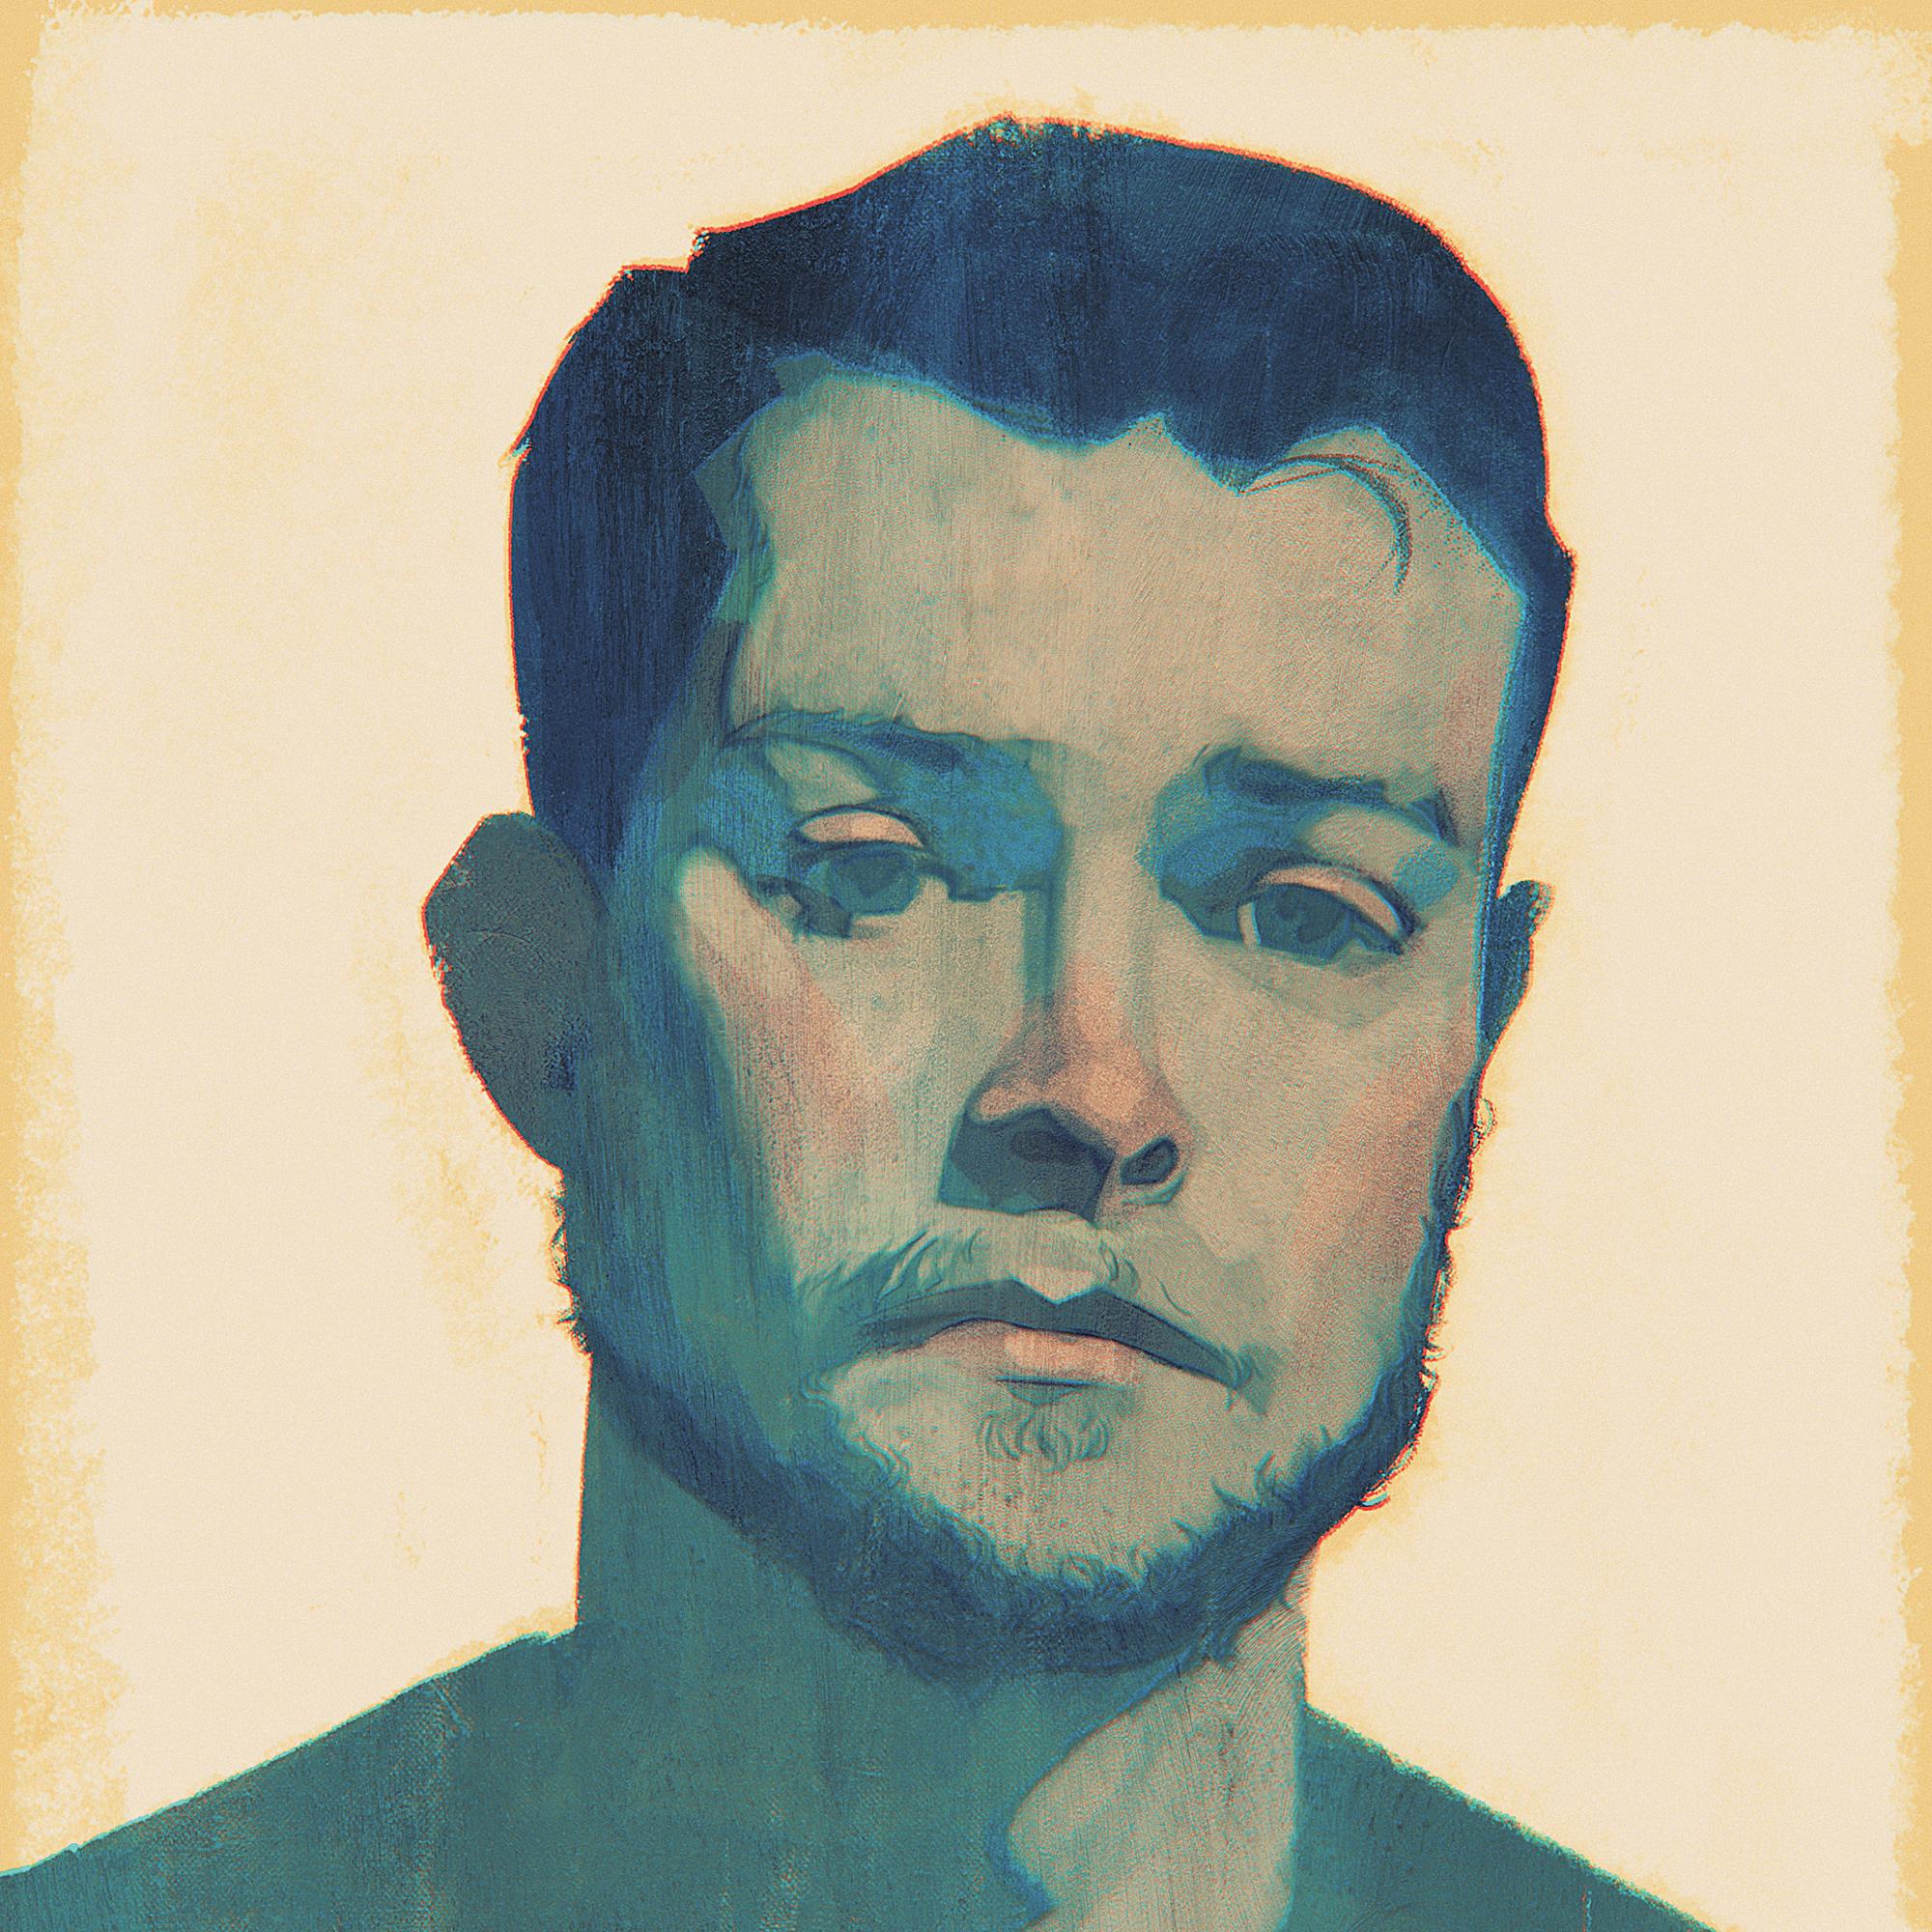 david_portrait.jpg